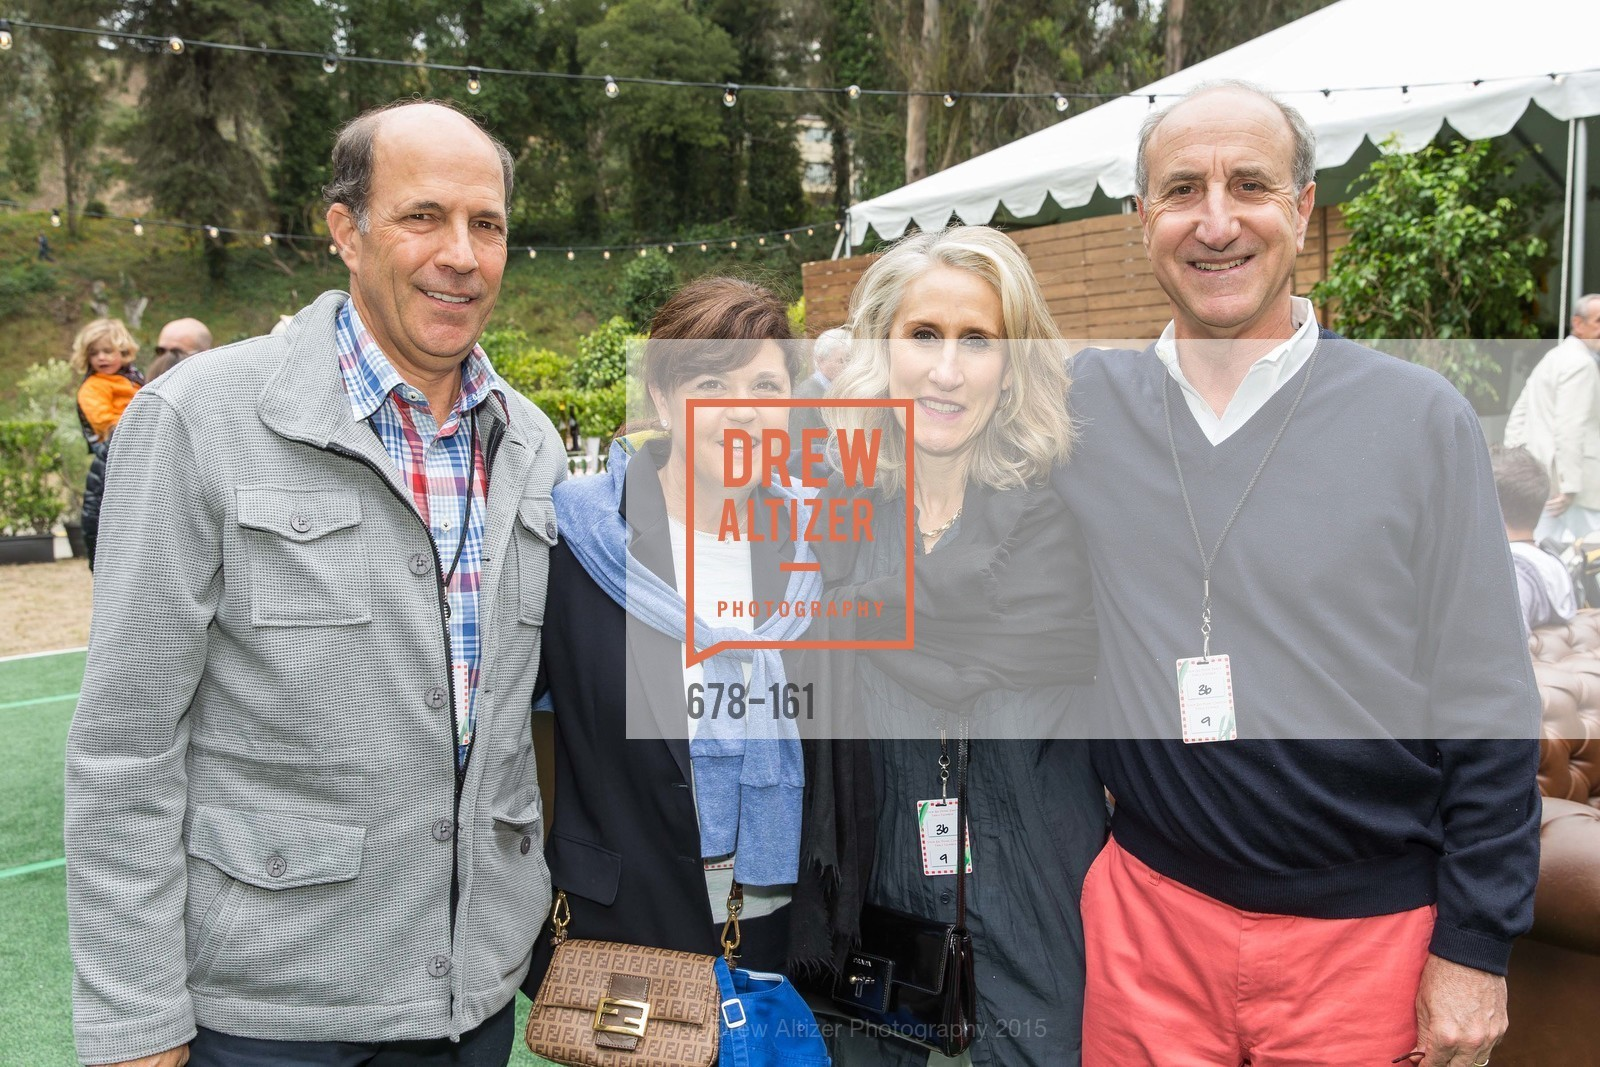 John Roos, Susie Roos, Jamie Meyers, Mark Meyers, THE BIG PICNIC Kicking off  2015 Stern Grove Season, Stern Grove. 2750 19th Avenue, June 14th, 2015